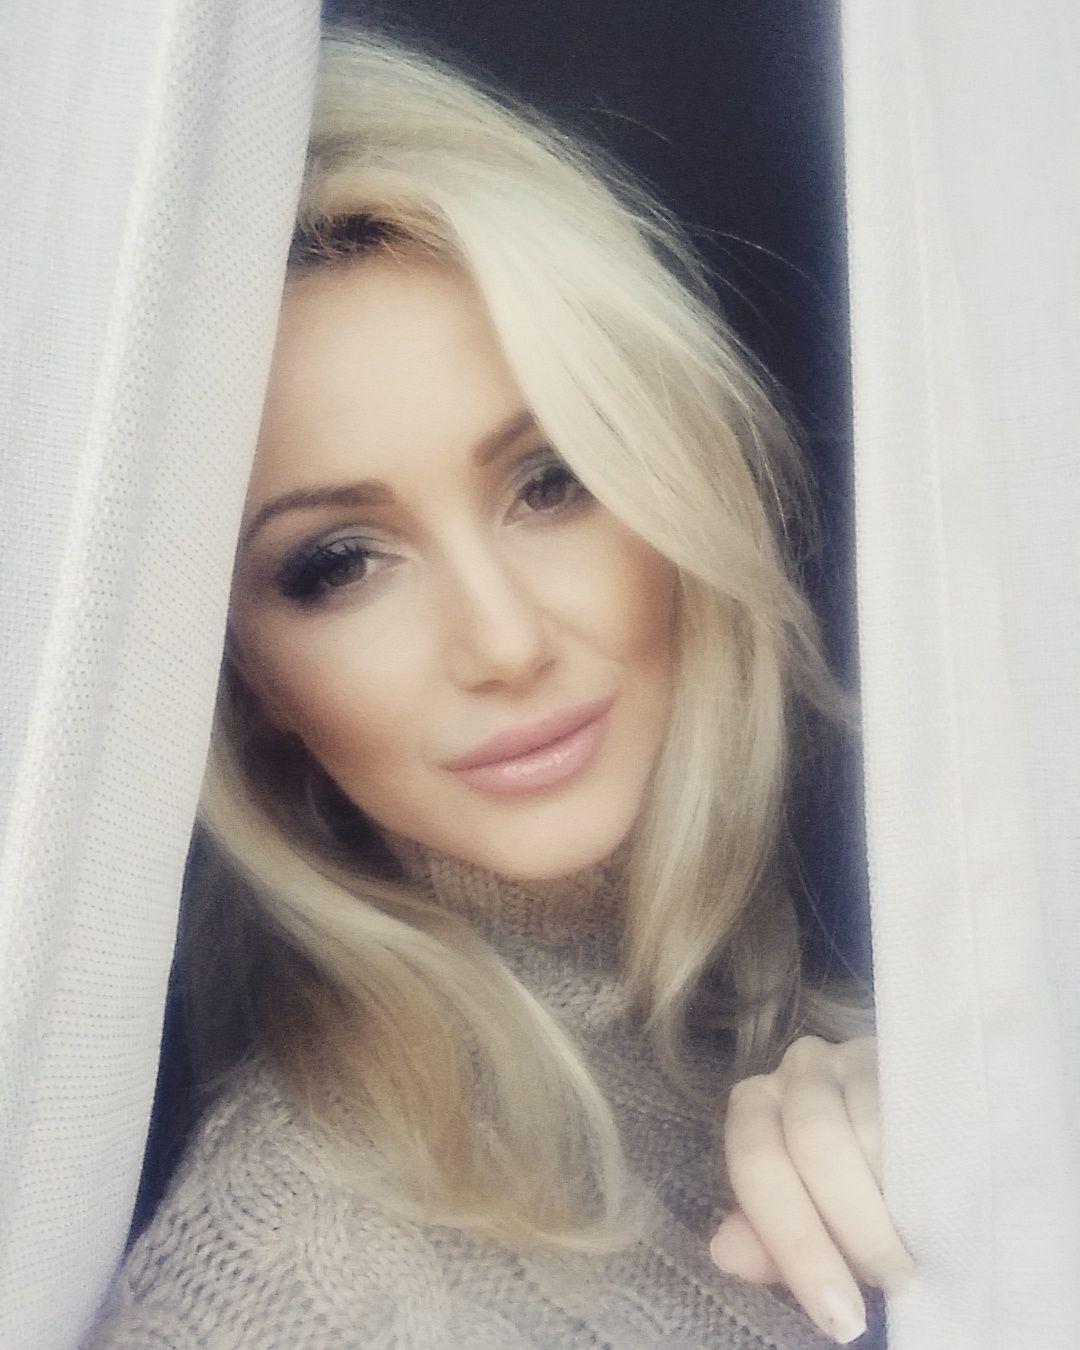 Pin by nicoleta nicole on blonde woman pinterest blonde women